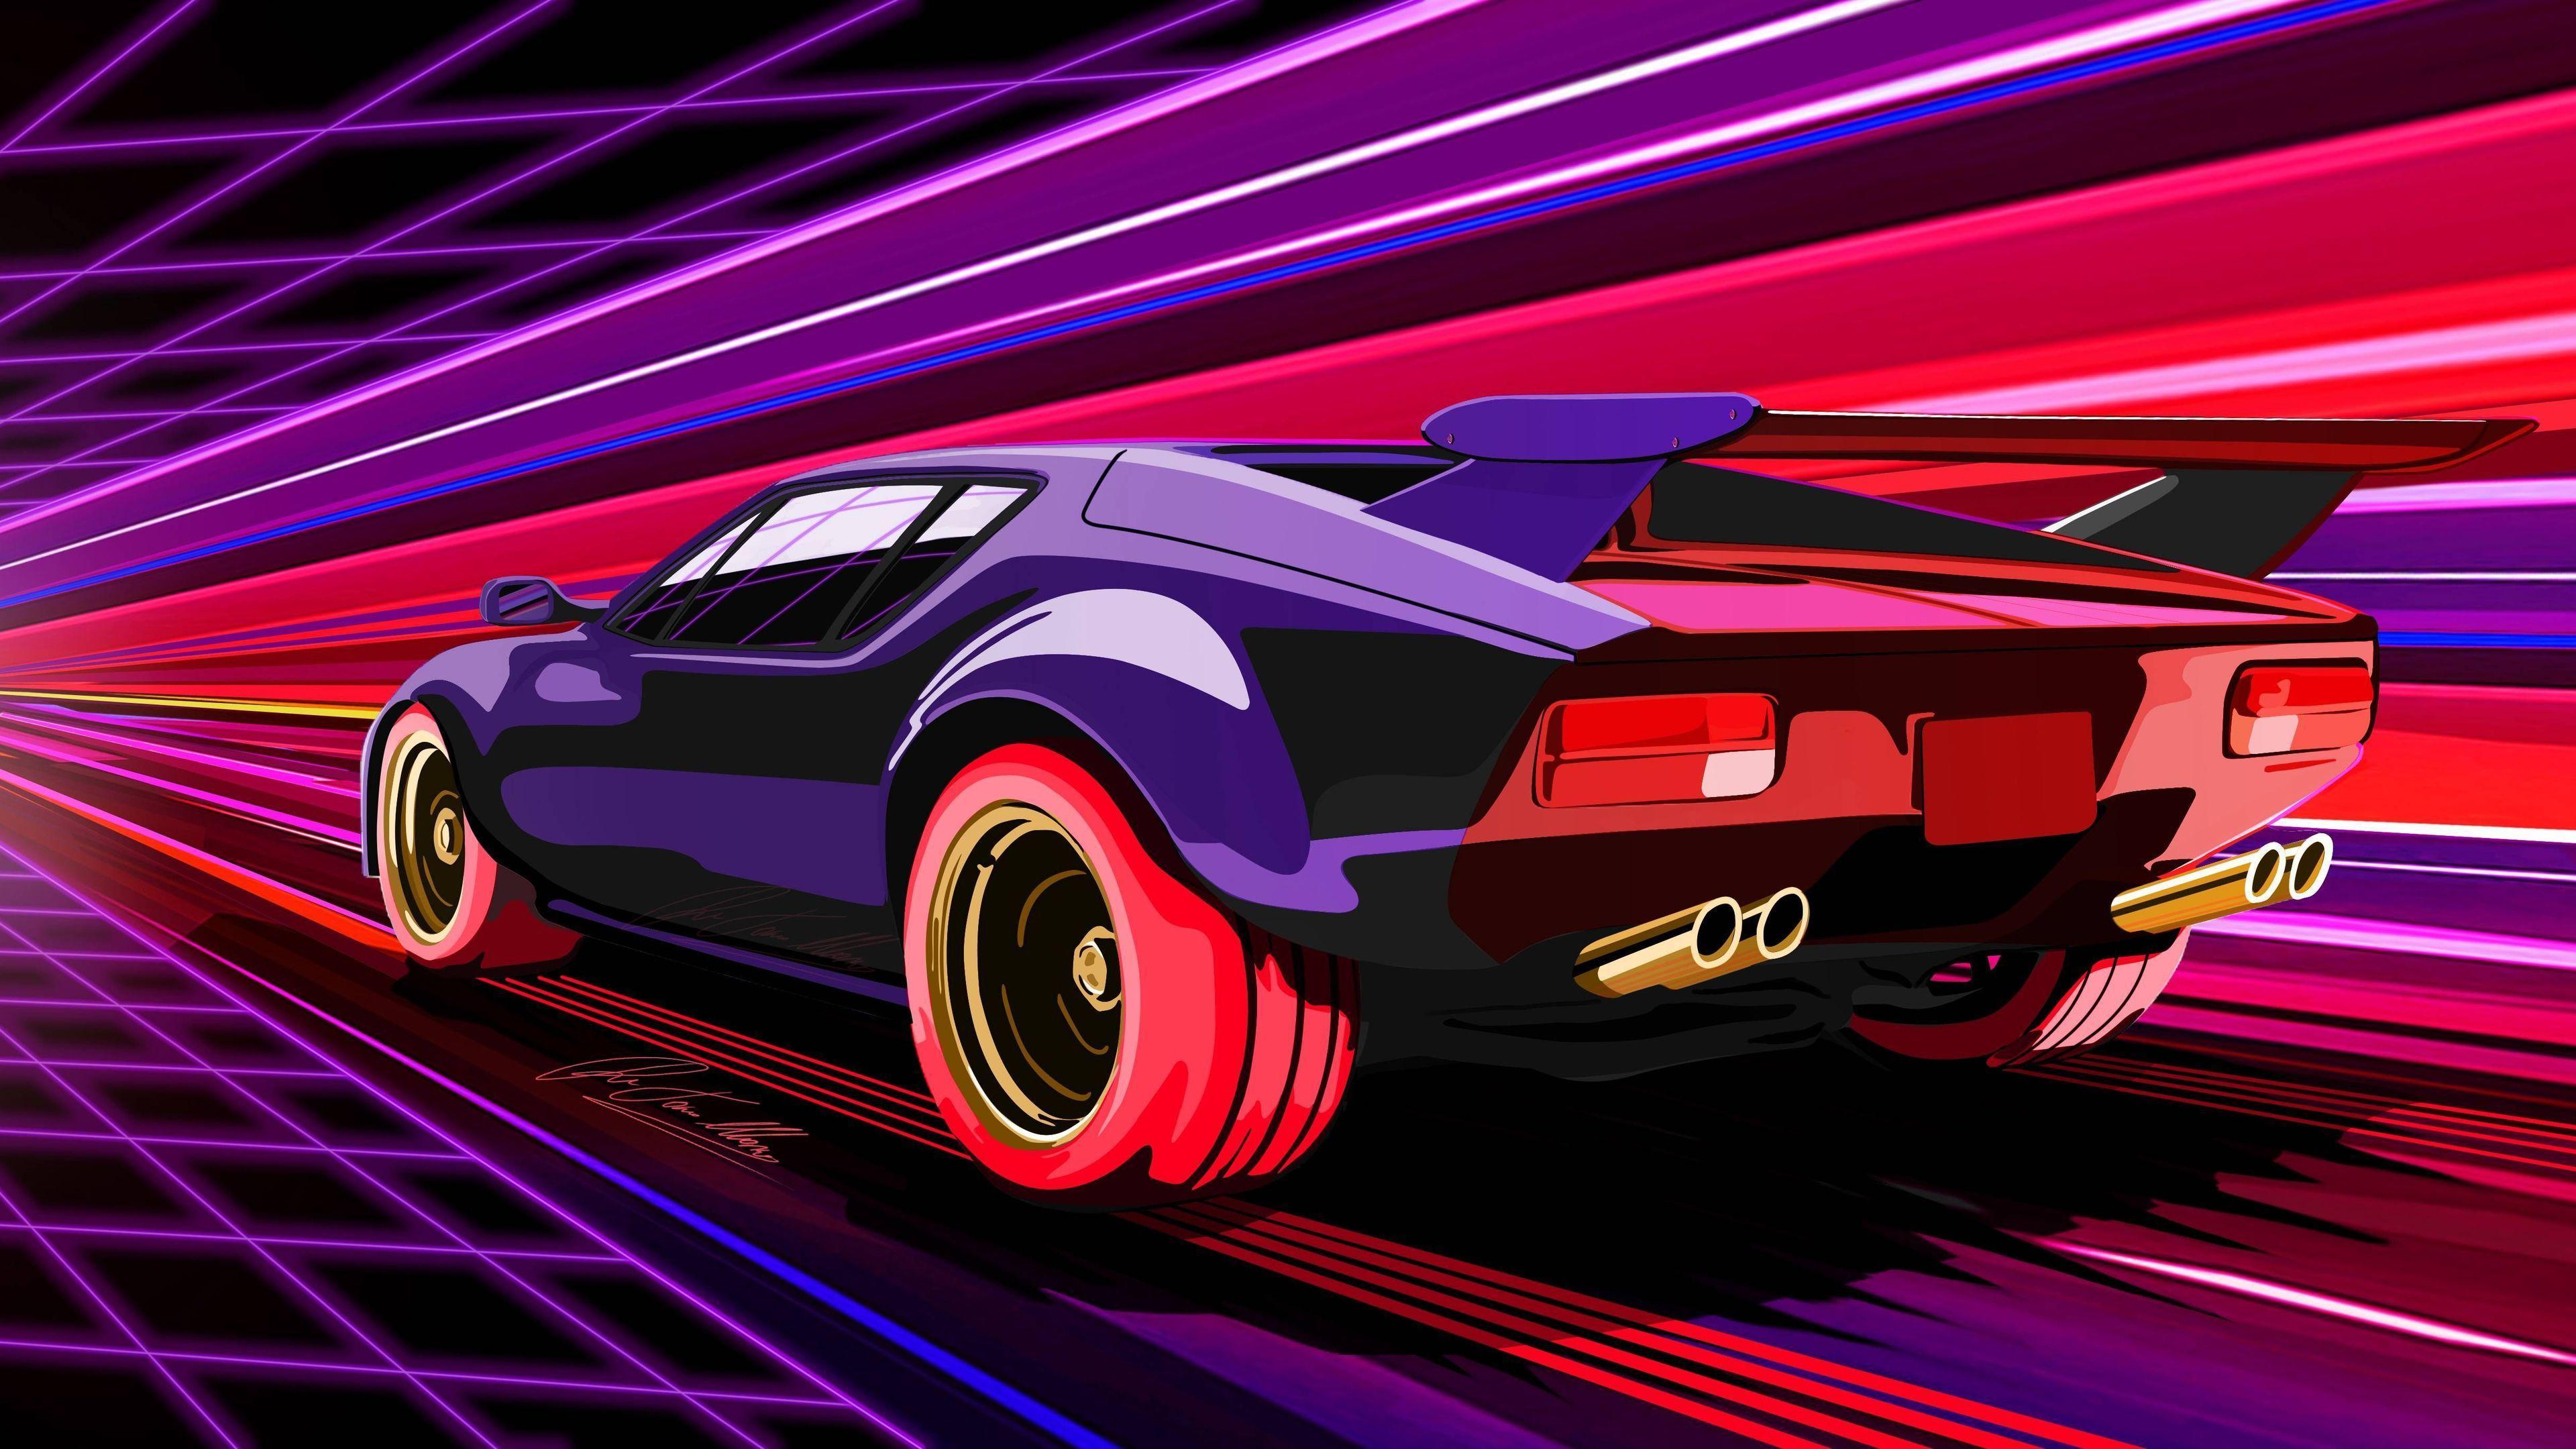 3840x2160 Hình nền 4k Retro Racing Muscle Car 4k Hình nền 4k, 5k